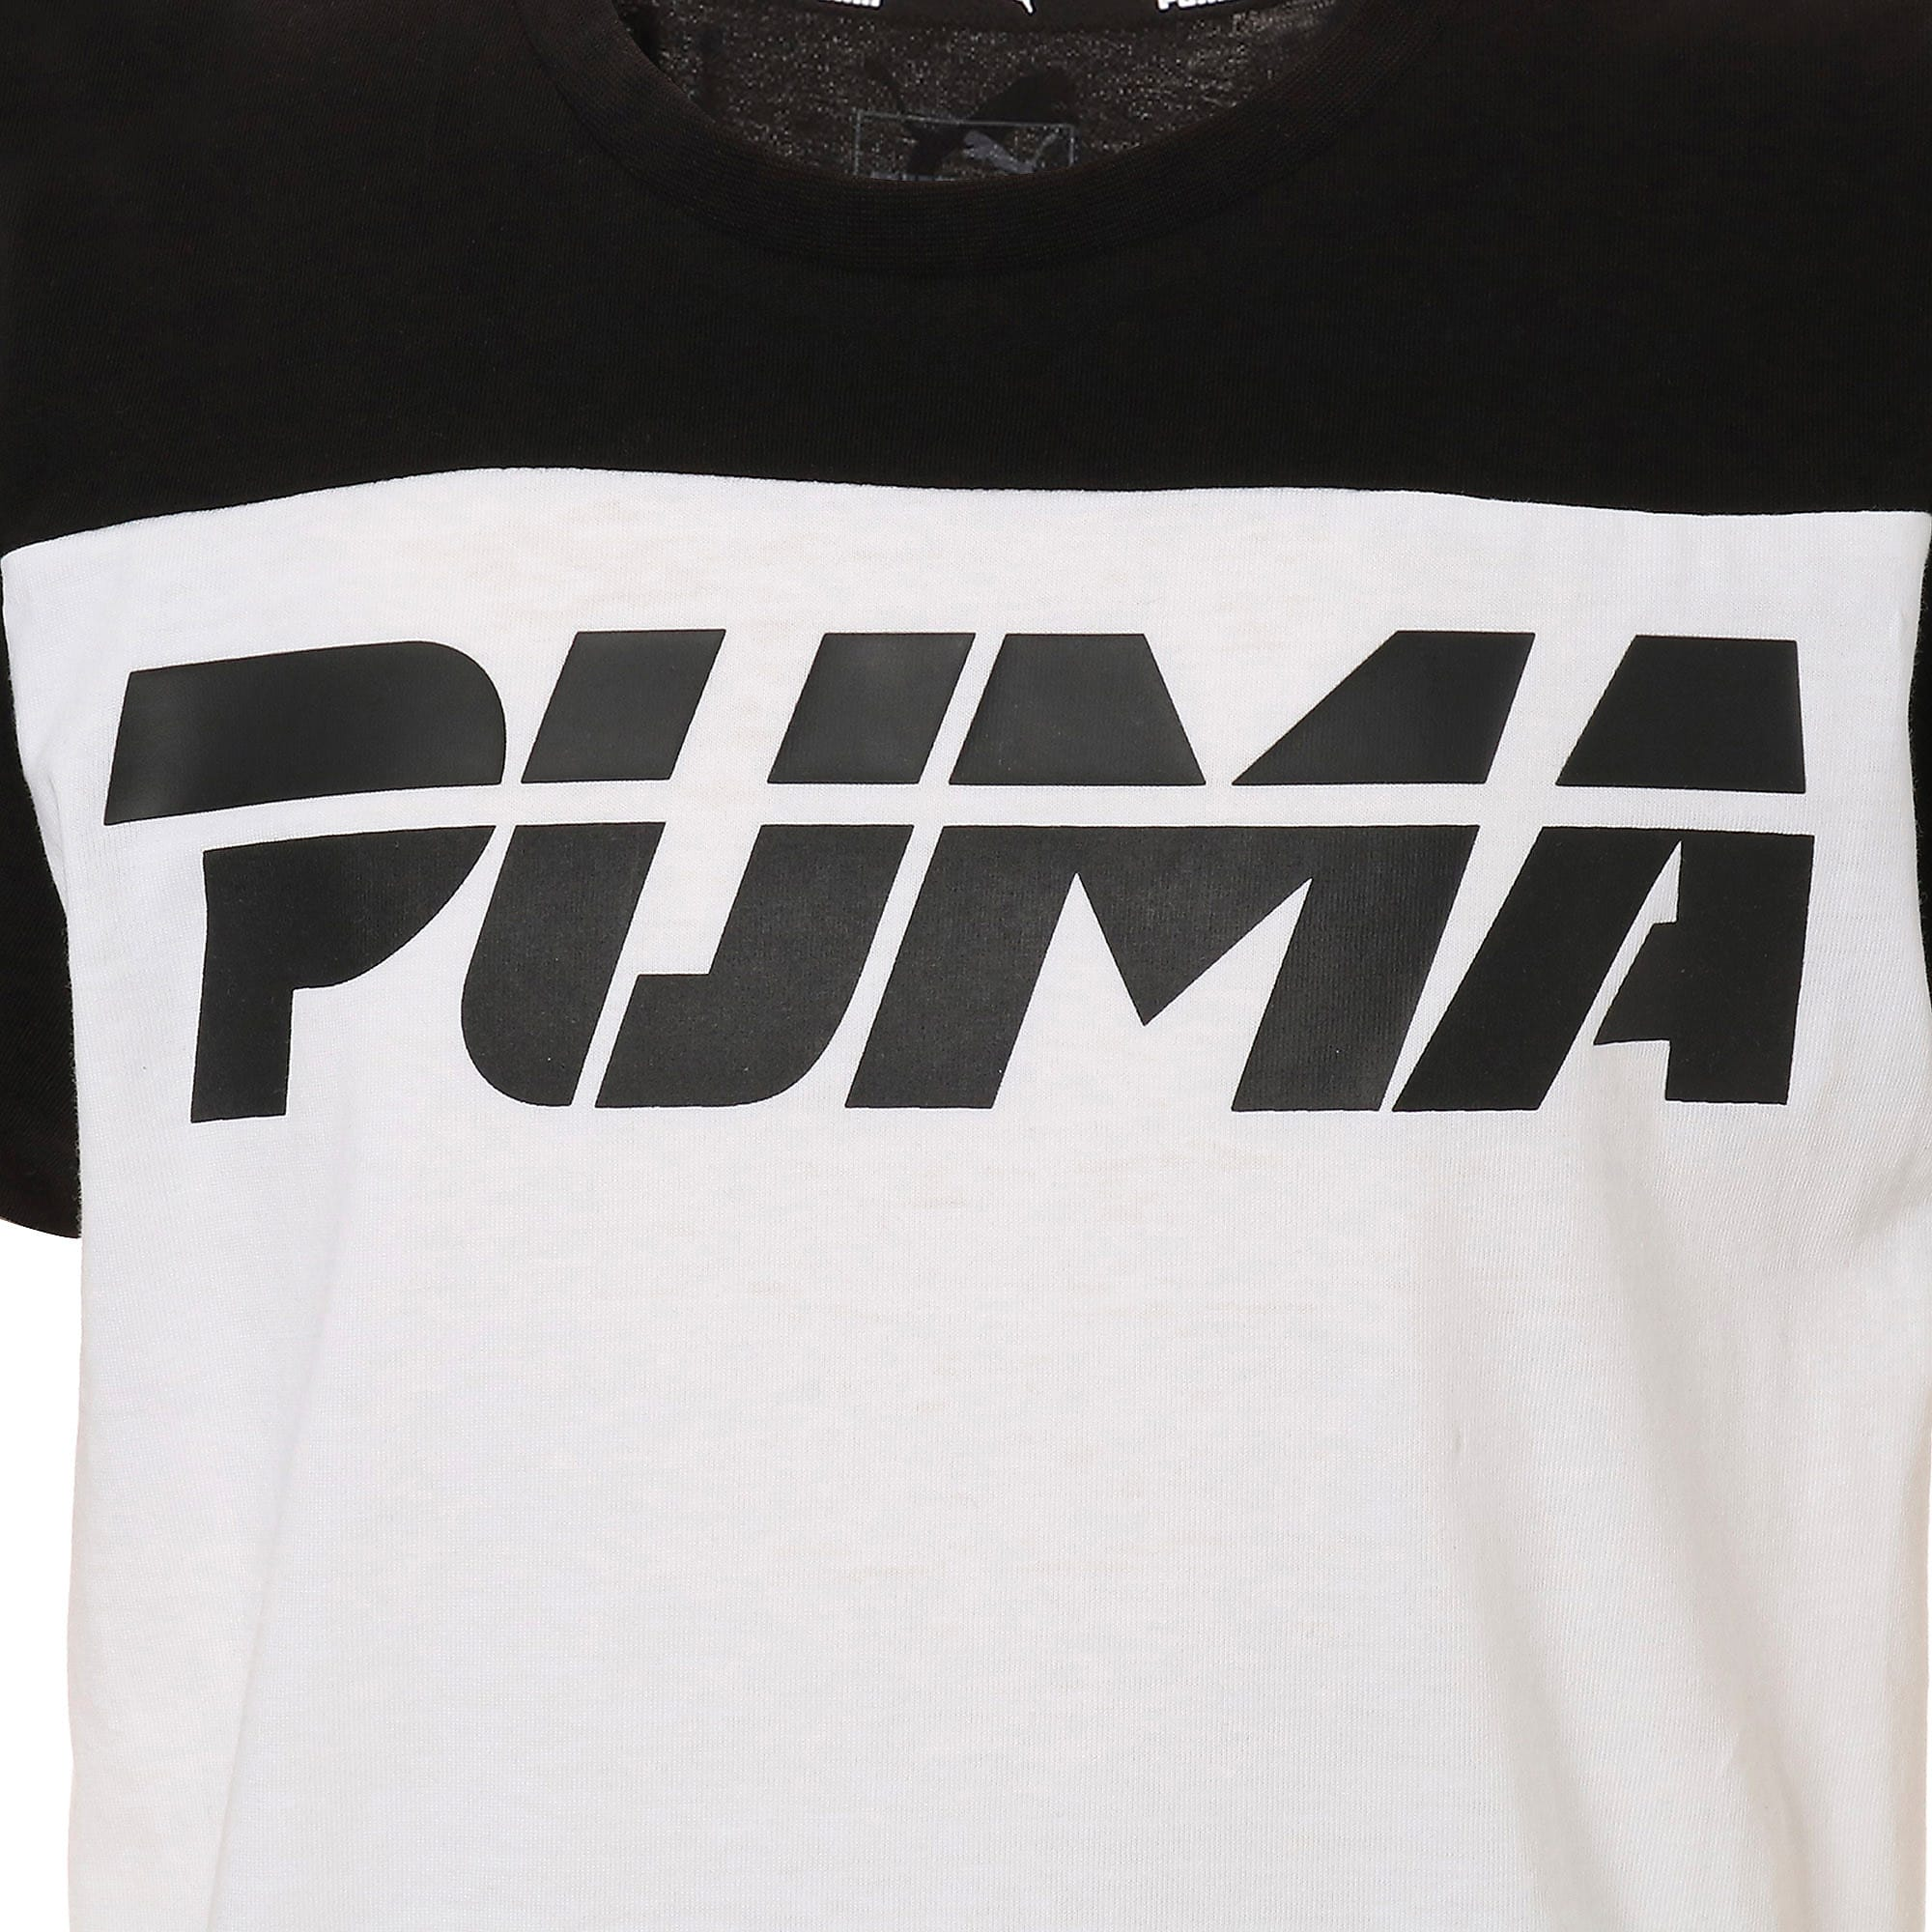 Thumbnail 4 of キッズ ALPHA SS トレンド Tシャツ 半袖, Puma Black, medium-JPN